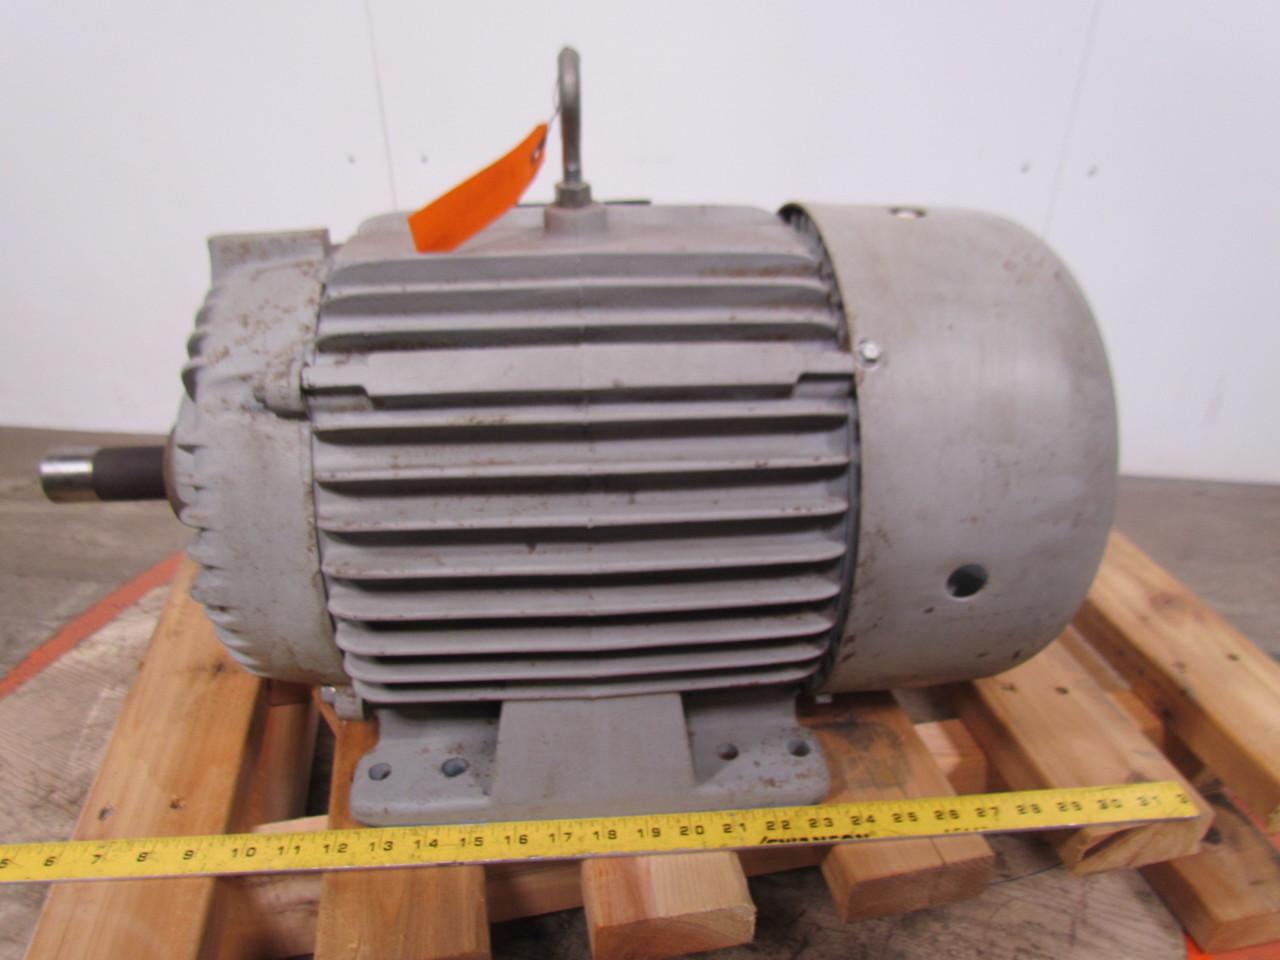 Delco e2 fg3104 electric motor 7 5hp 3ph 460v 1770rpm 254u for 5hp 3ph electric motor